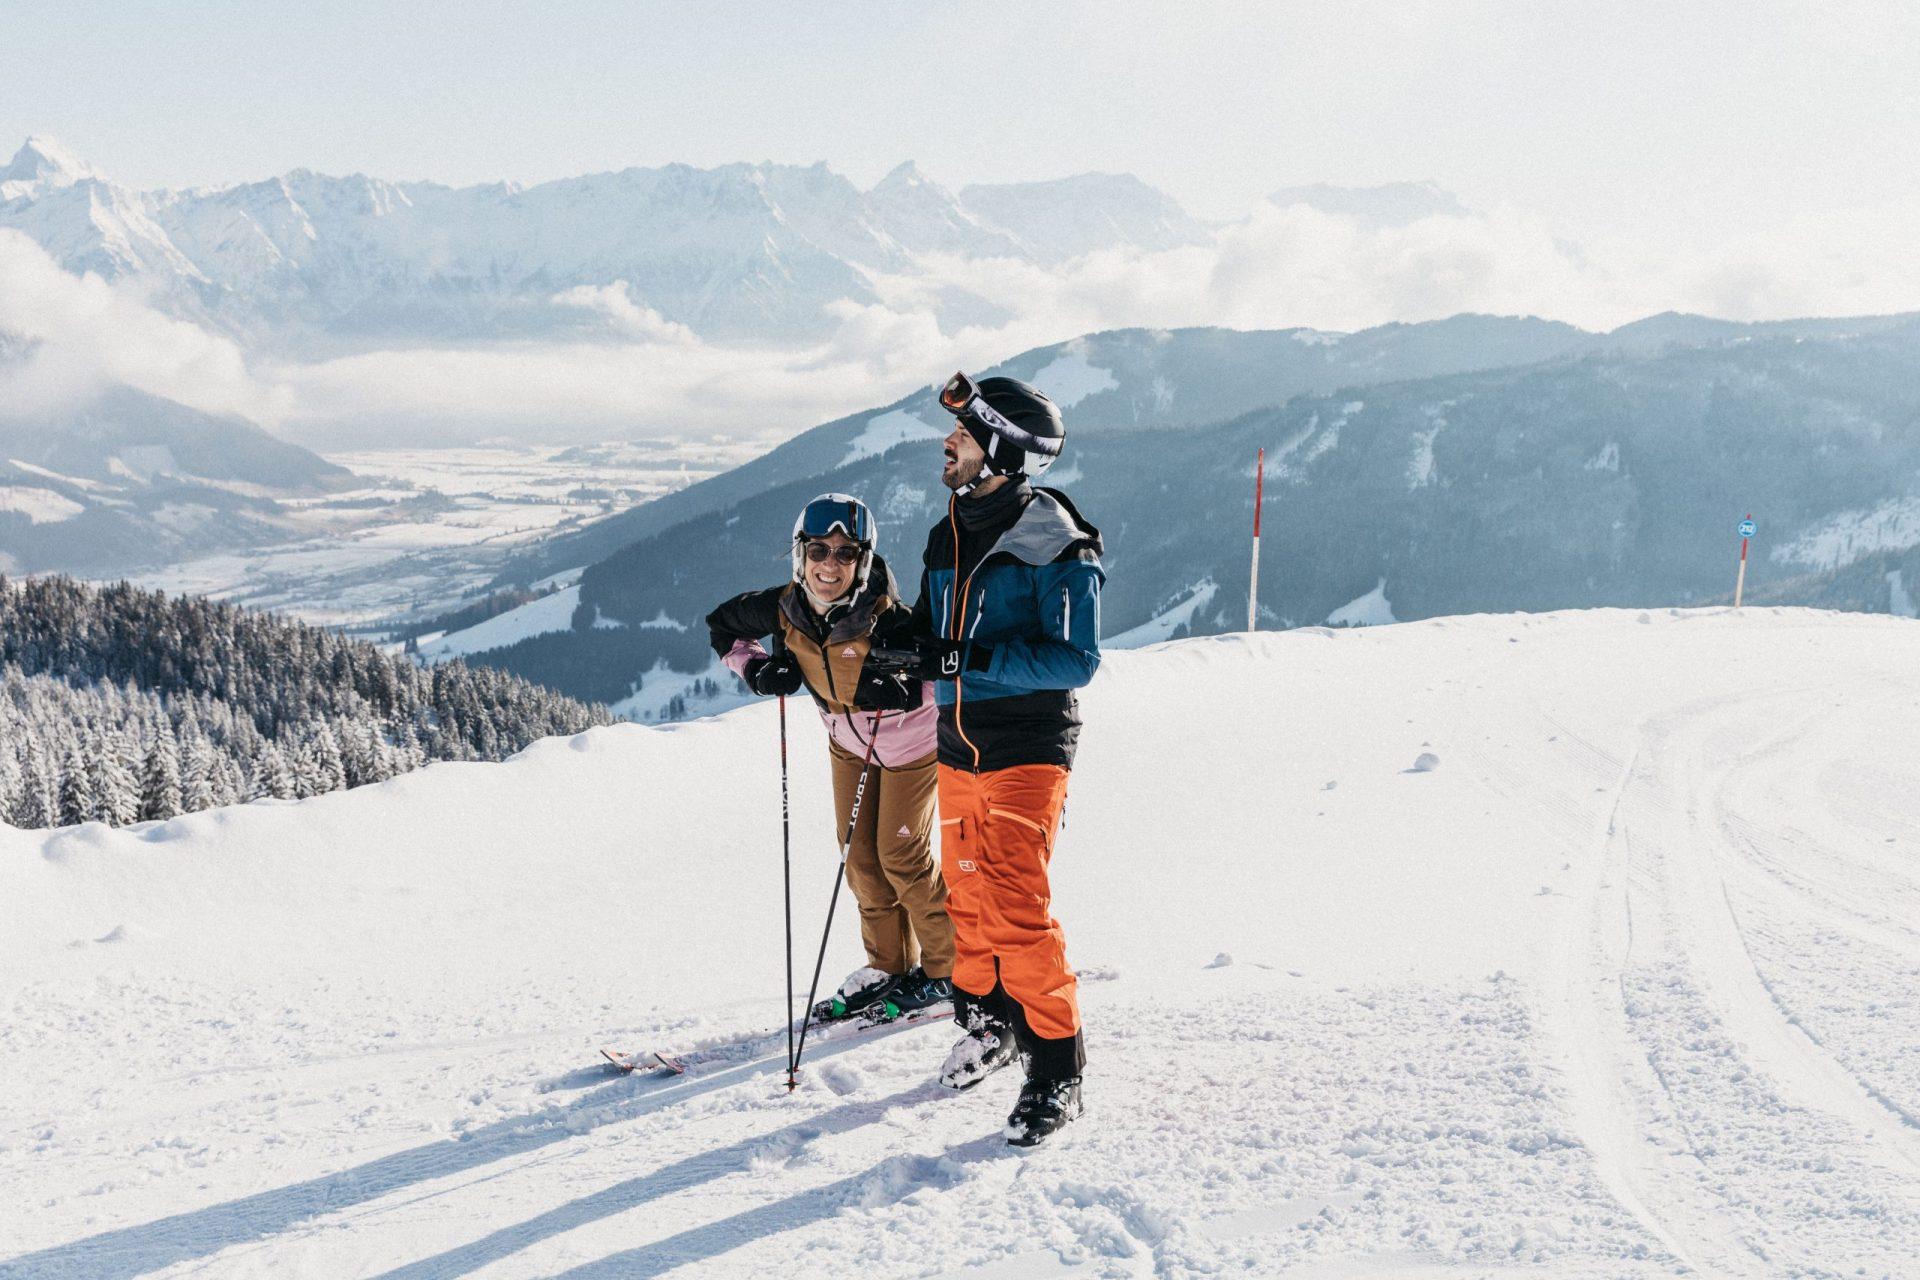 Berg_Skifahren_Leogang_c_biohotel-rupertus-leogang FotoHeldentheather